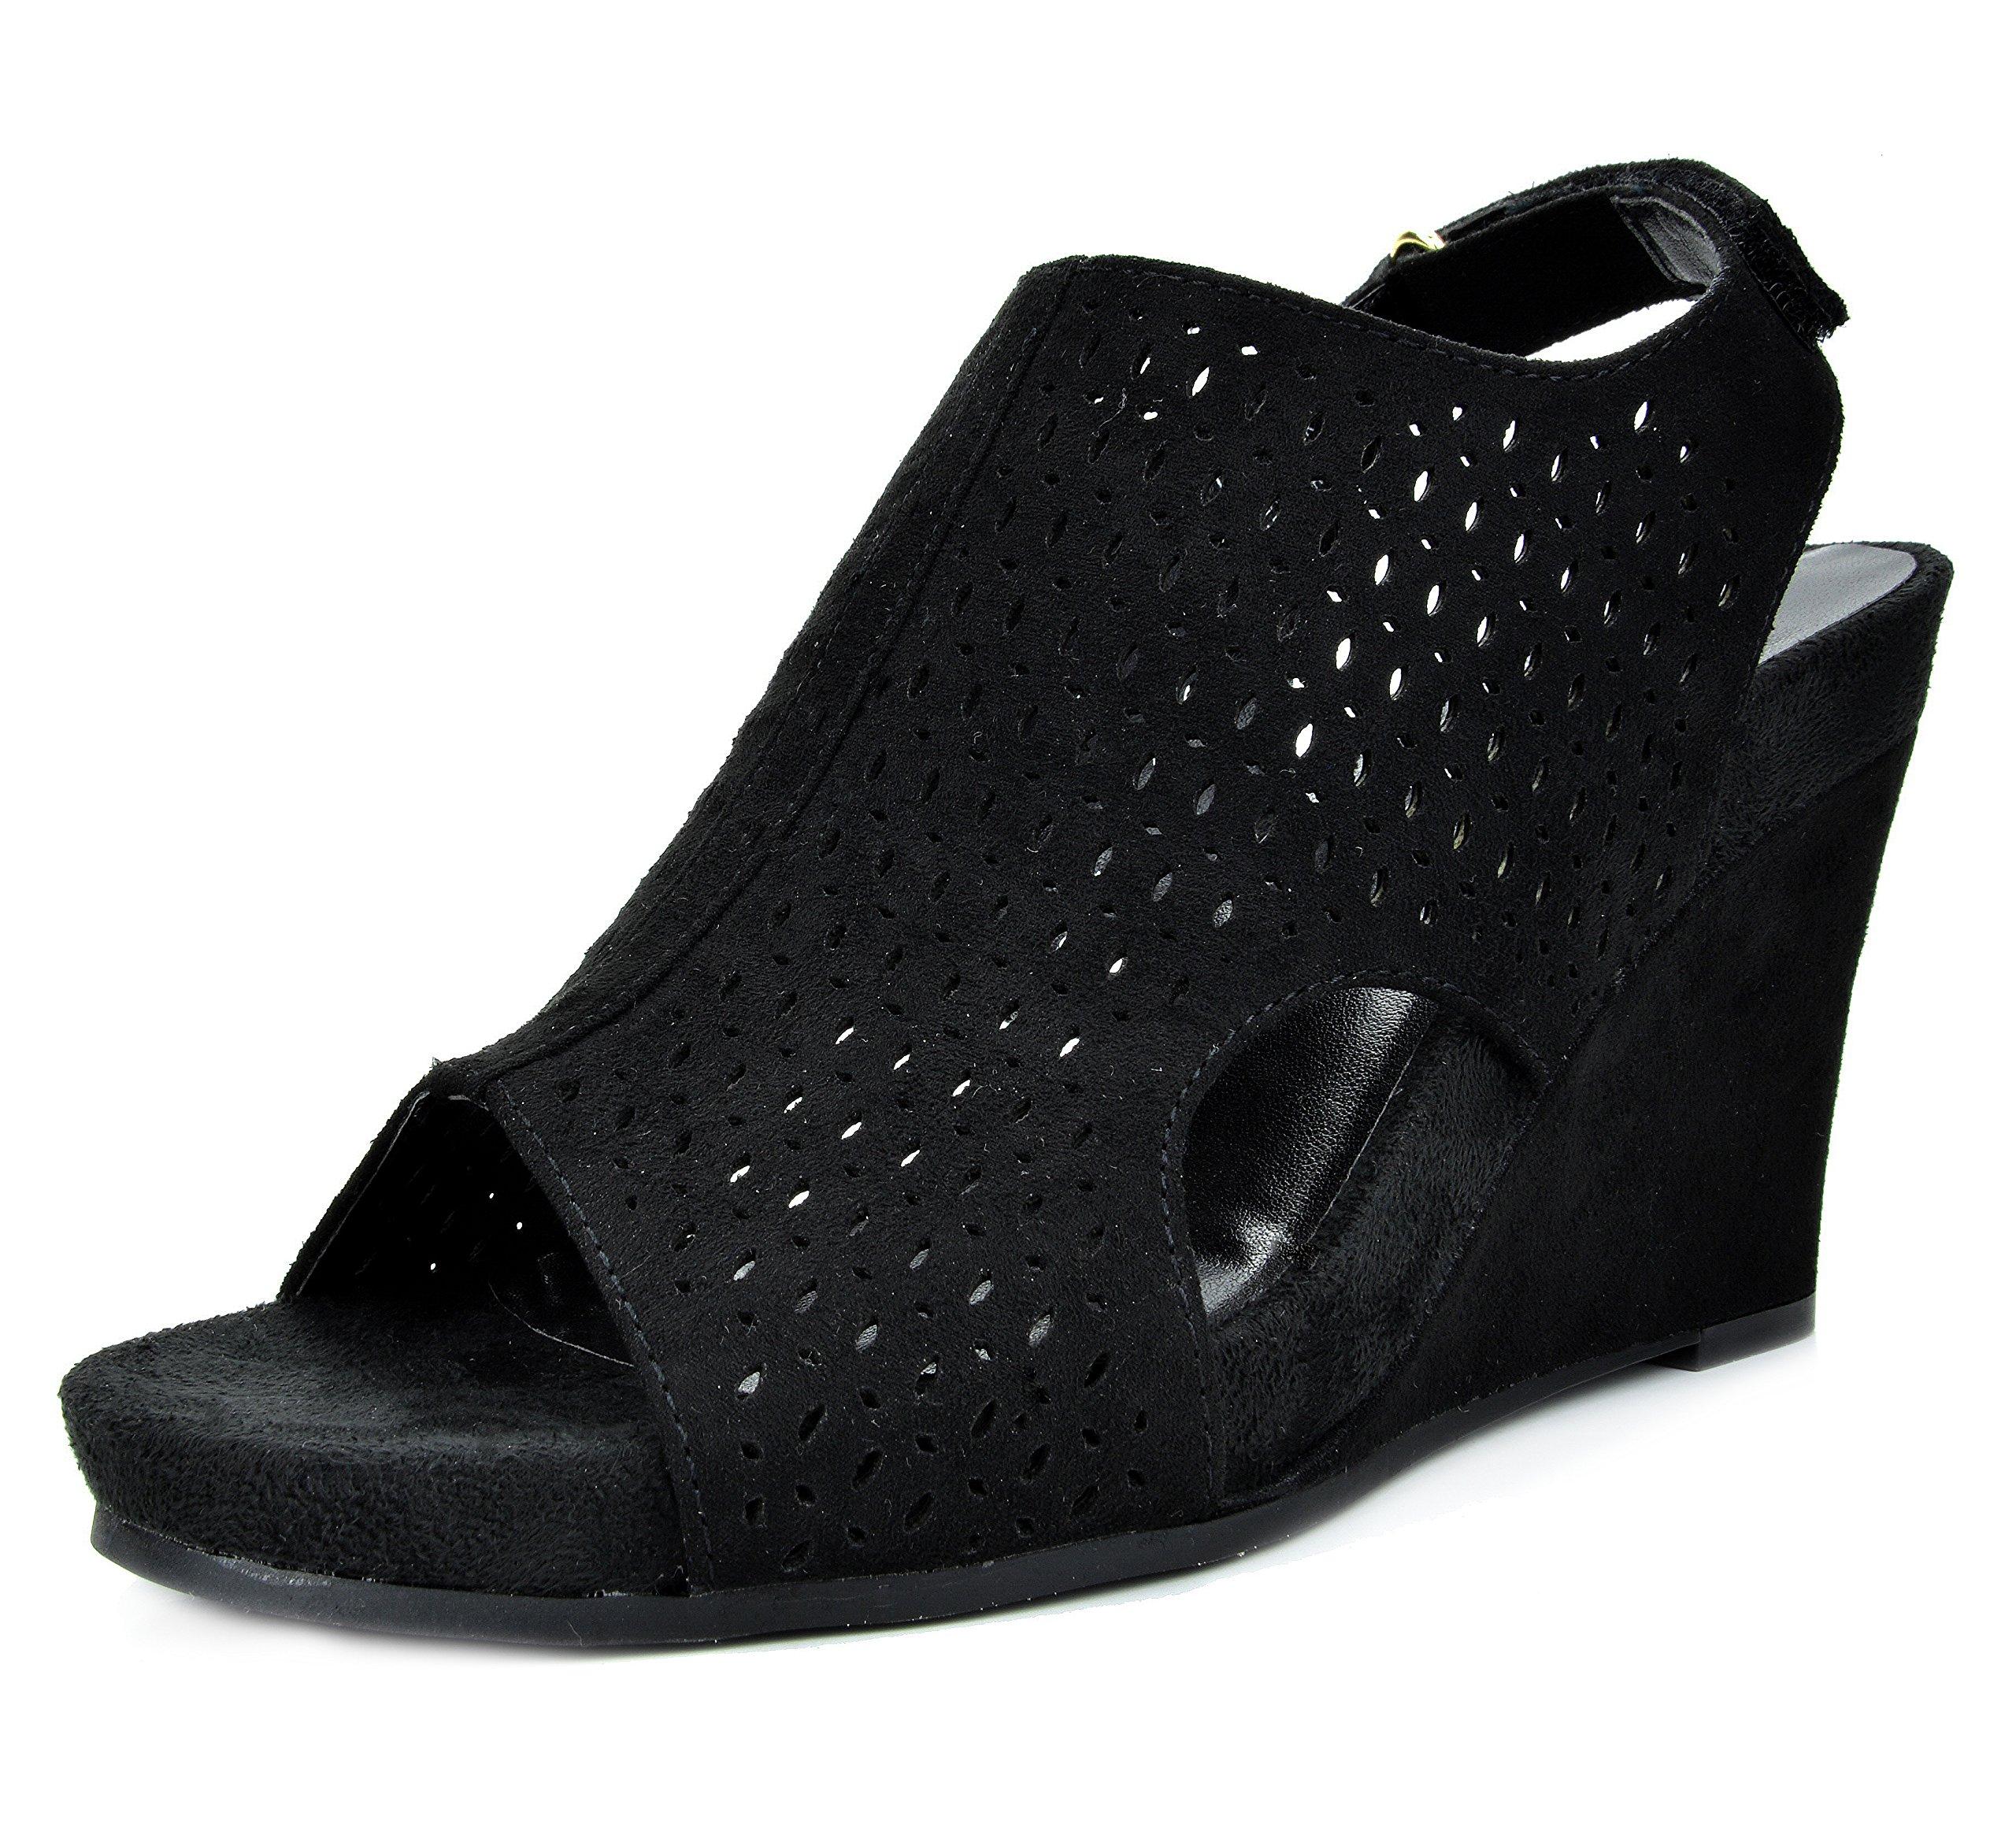 TOETOS Women's Solsoft-6 Black Mid Heel Platform Wedges Sandals - 8.5 M US